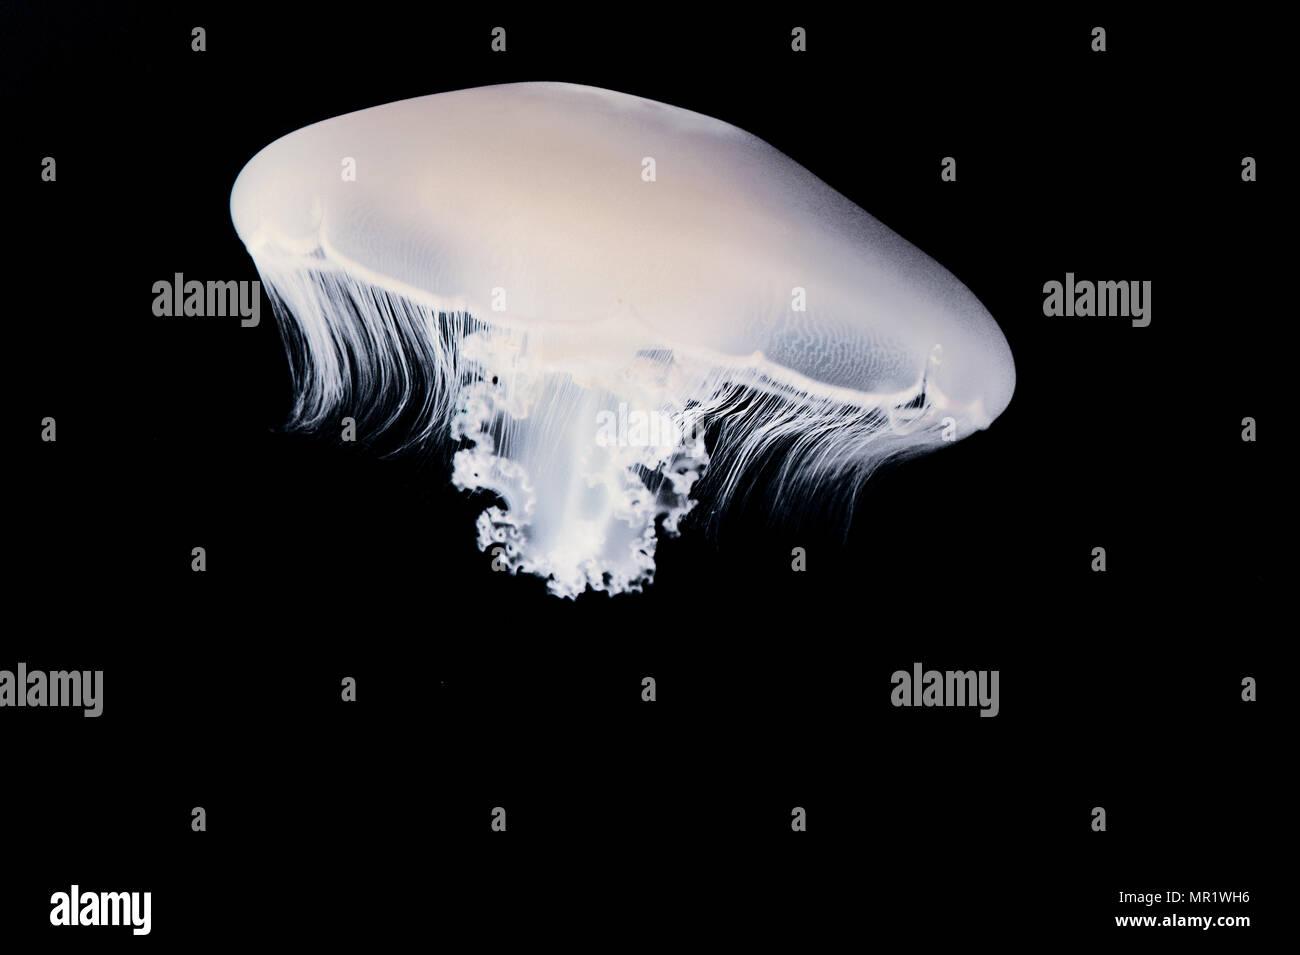 Moon jelly (Aurelia labiata) Photo Stock